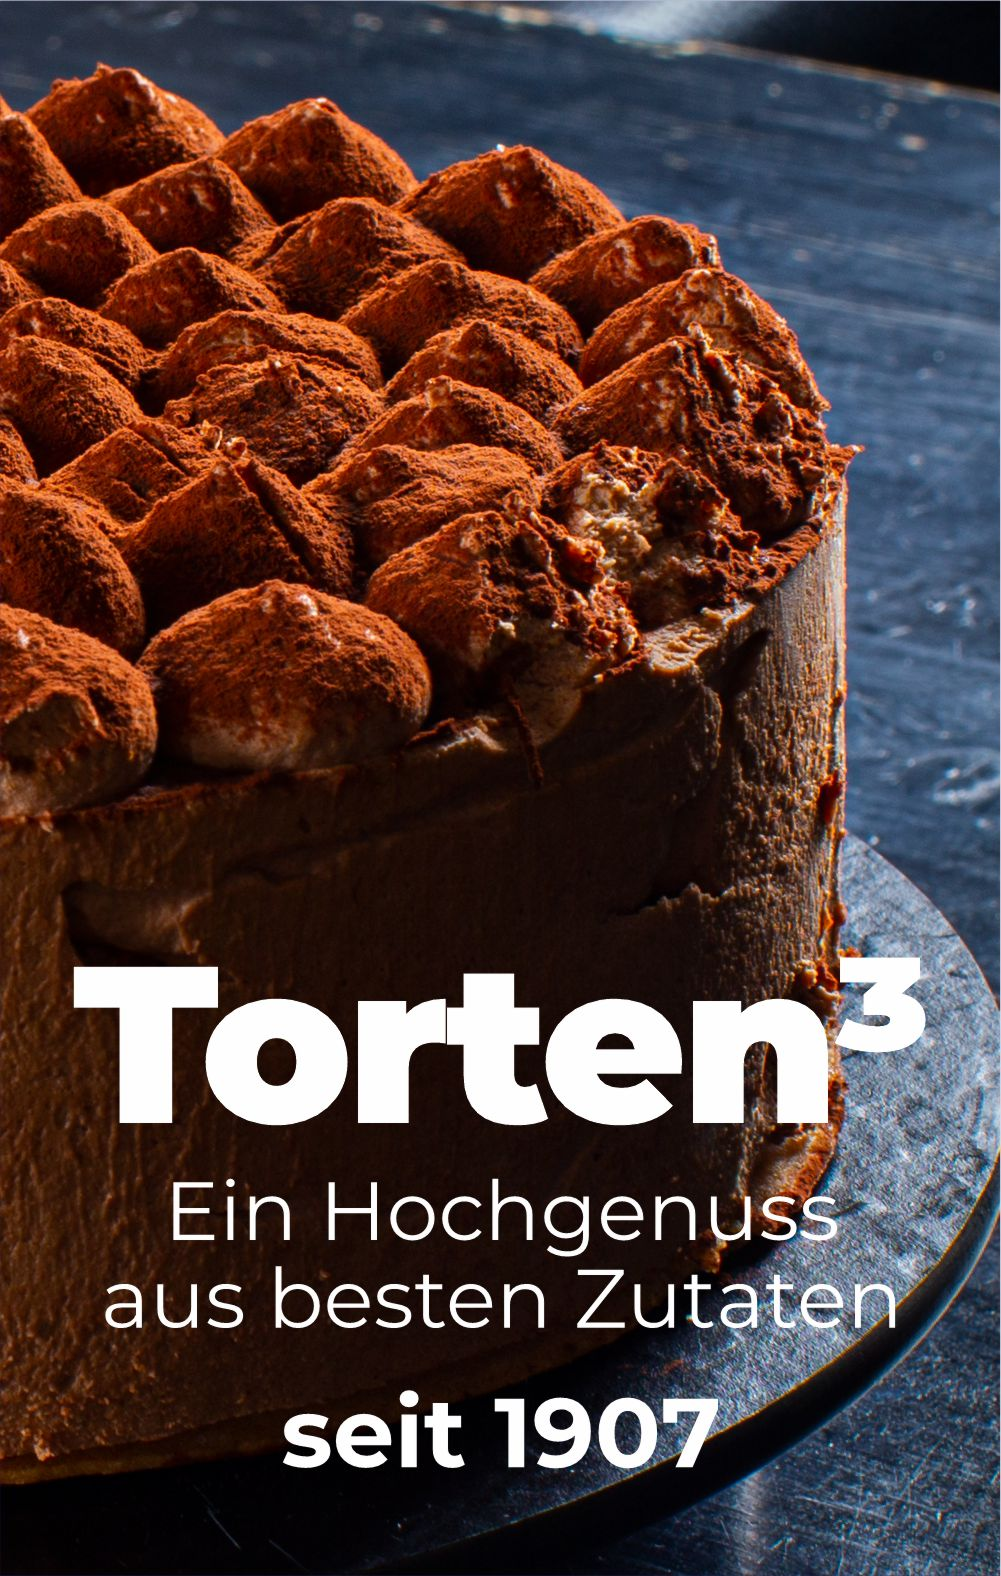 tismes_torten_003_xs